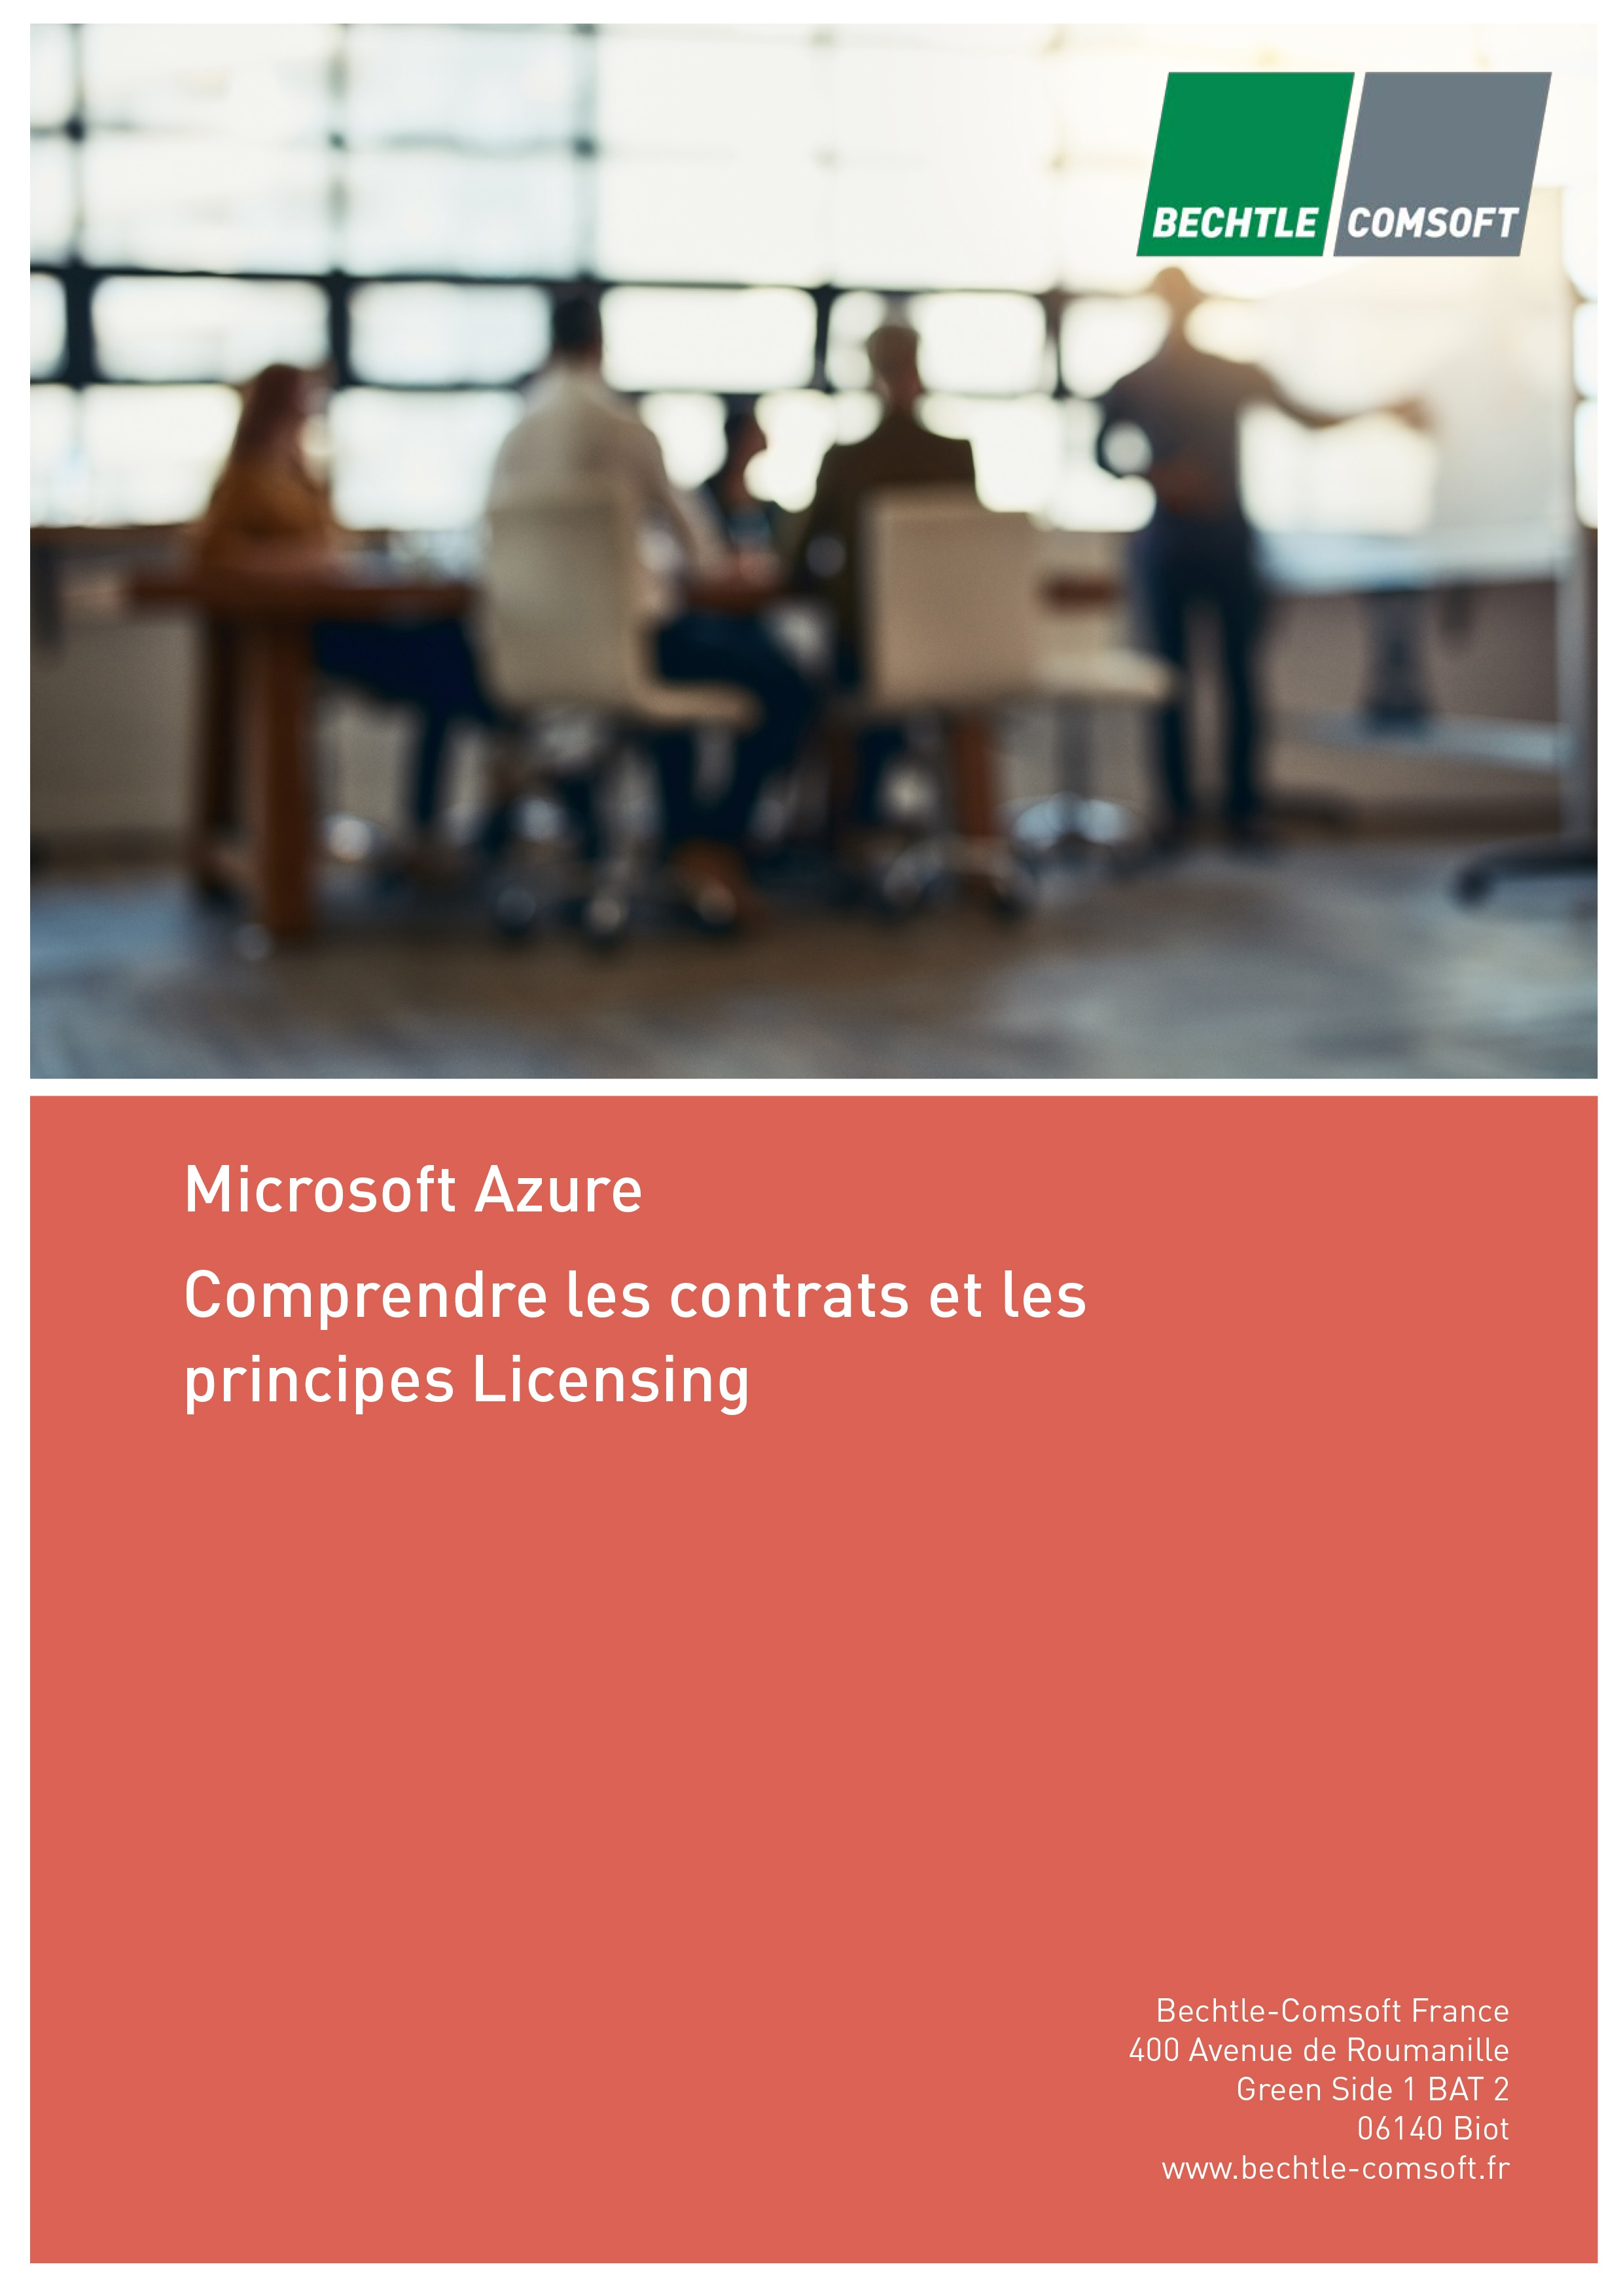 Microsoft Azure Comprendre les contrats et les principes Licensing-1.jpg